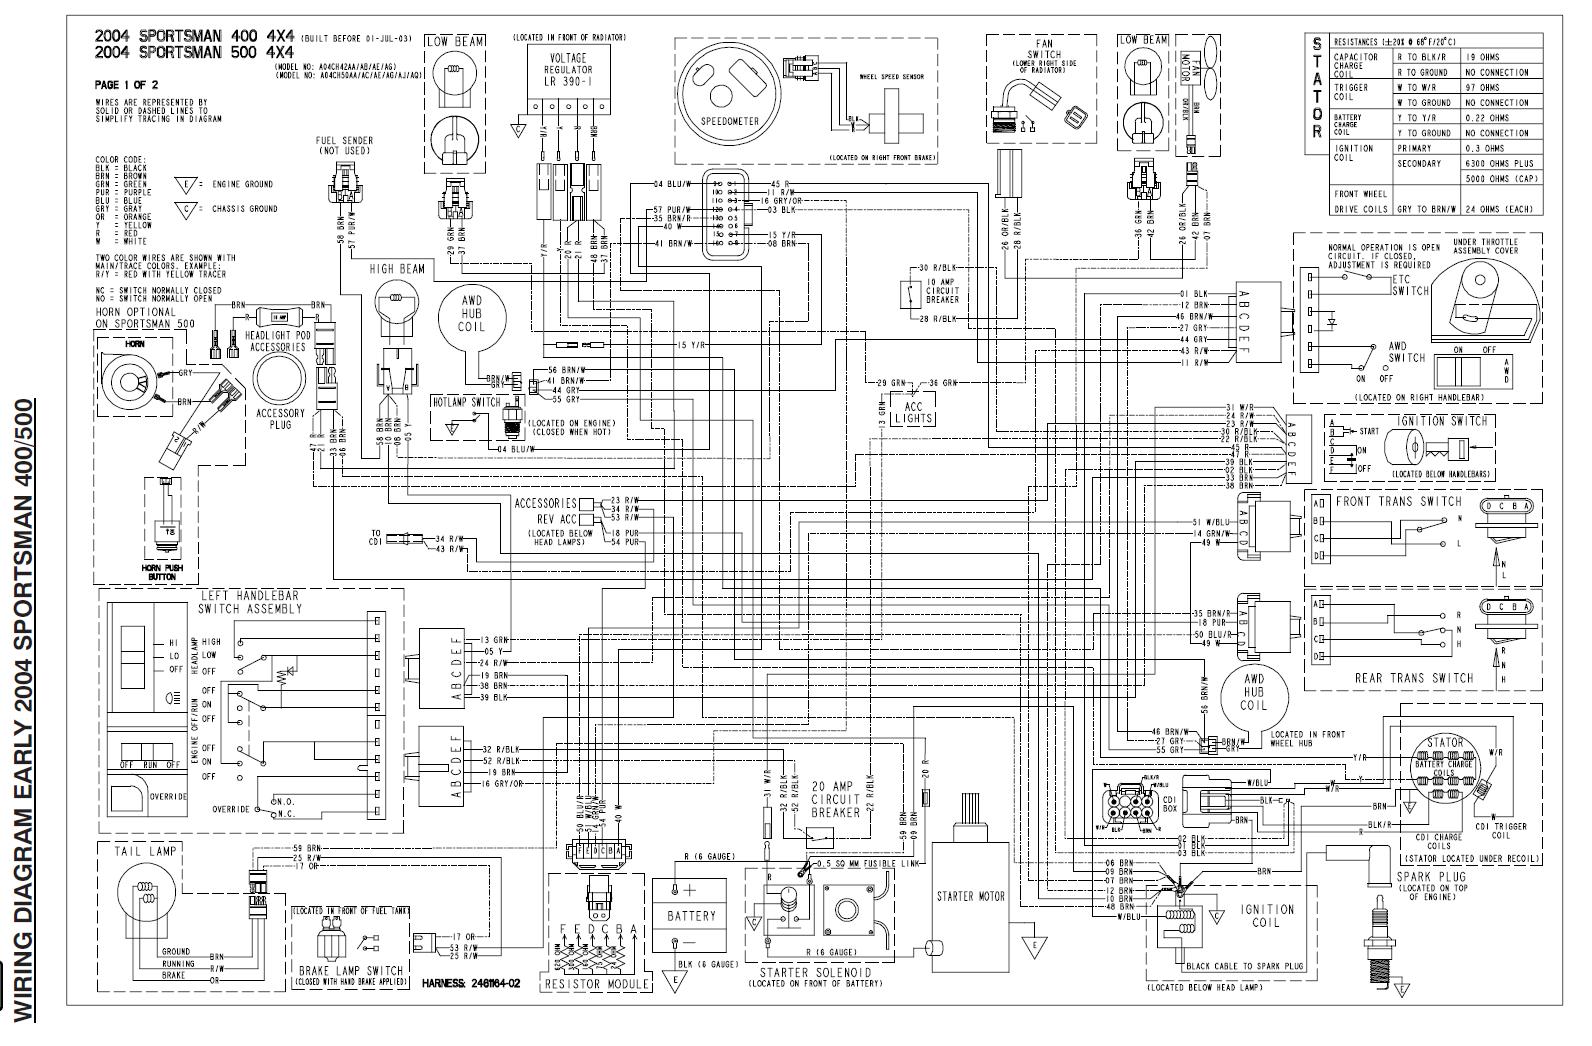 2005 Maserati Wiring Diagram Free Picture Schematic